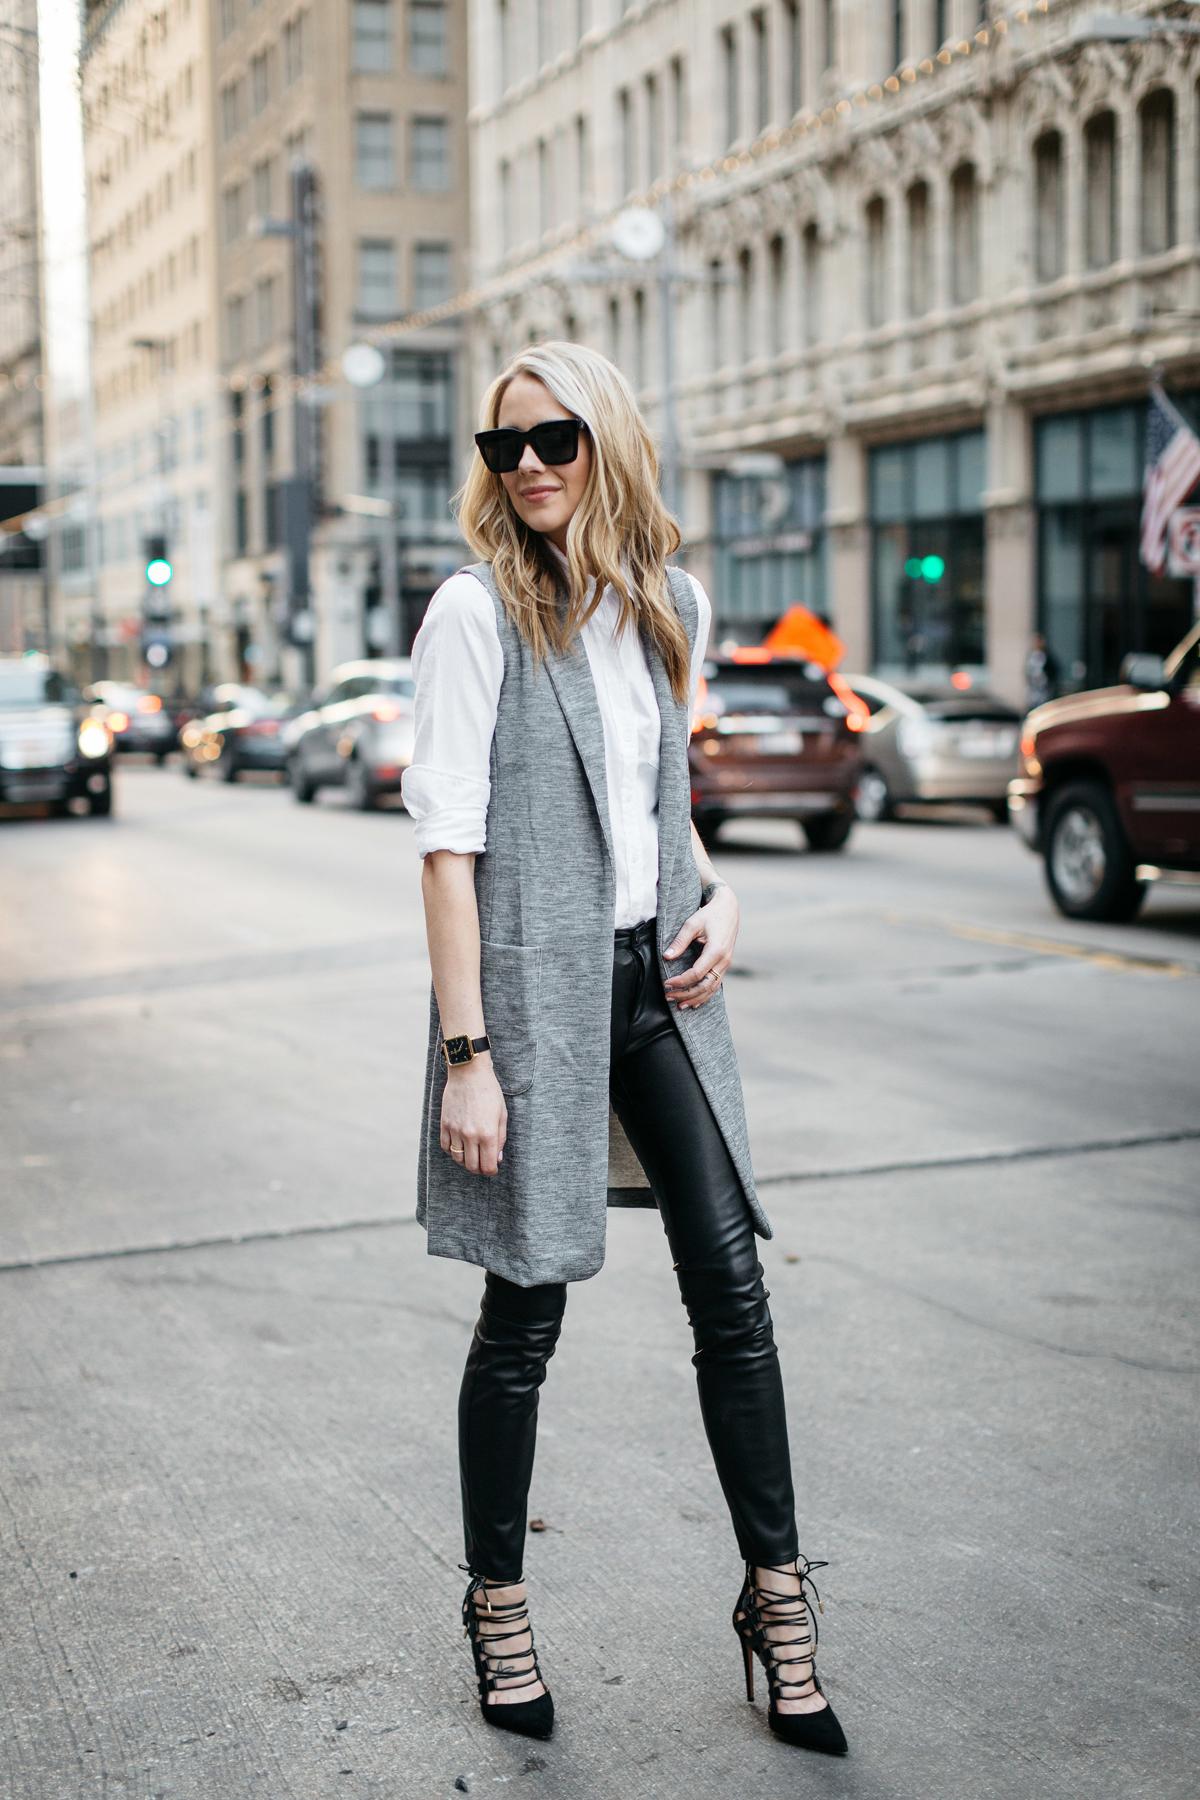 Fall Outfit, Winter Outfit, White Button-Down Shirt, Long Grey Vest, Faux Leather Black Pants, Chloe Faye Handbag, Aquazzura Amazon Pumps